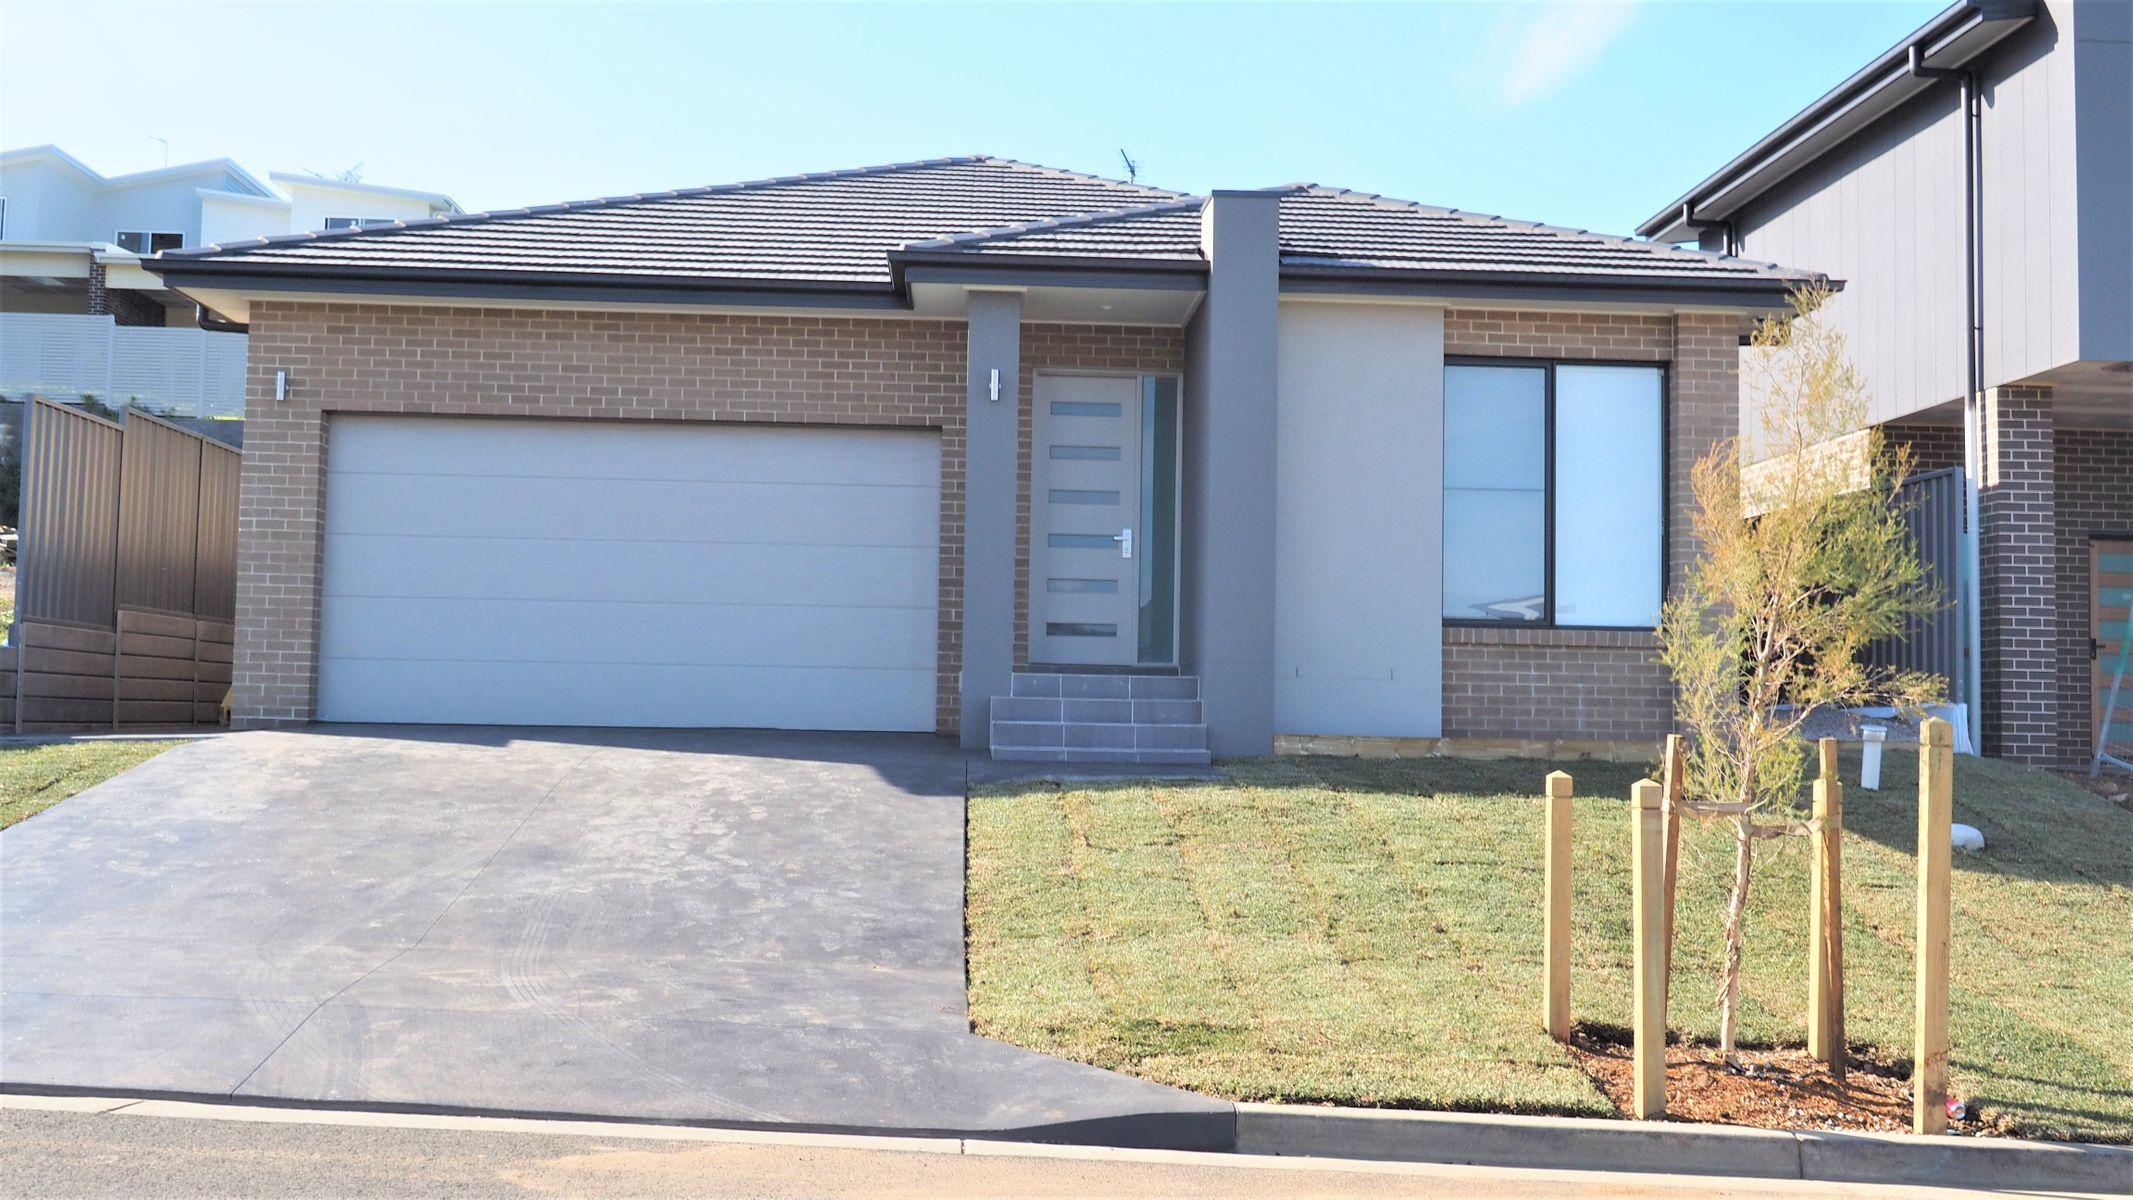 64 Saddleback Cres, Kembla Grange, NSW 2526